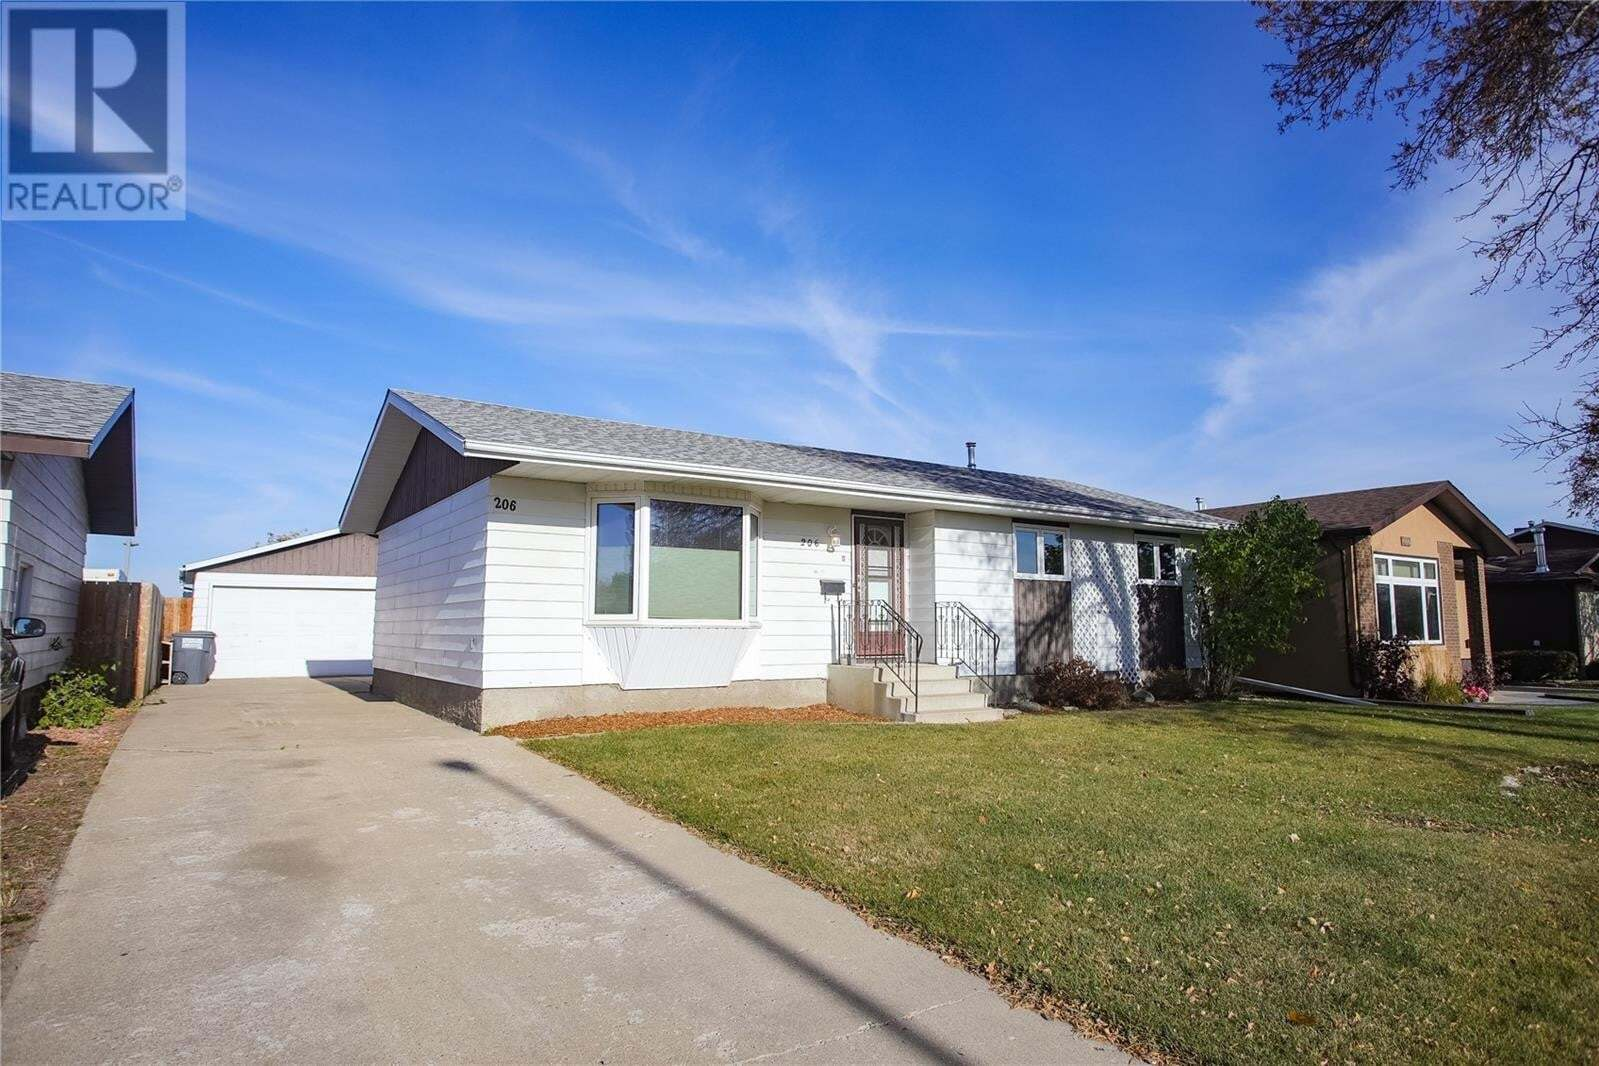 House for sale at 206 Postnikoff Cres Saskatoon Saskatchewan - MLS: SK830728